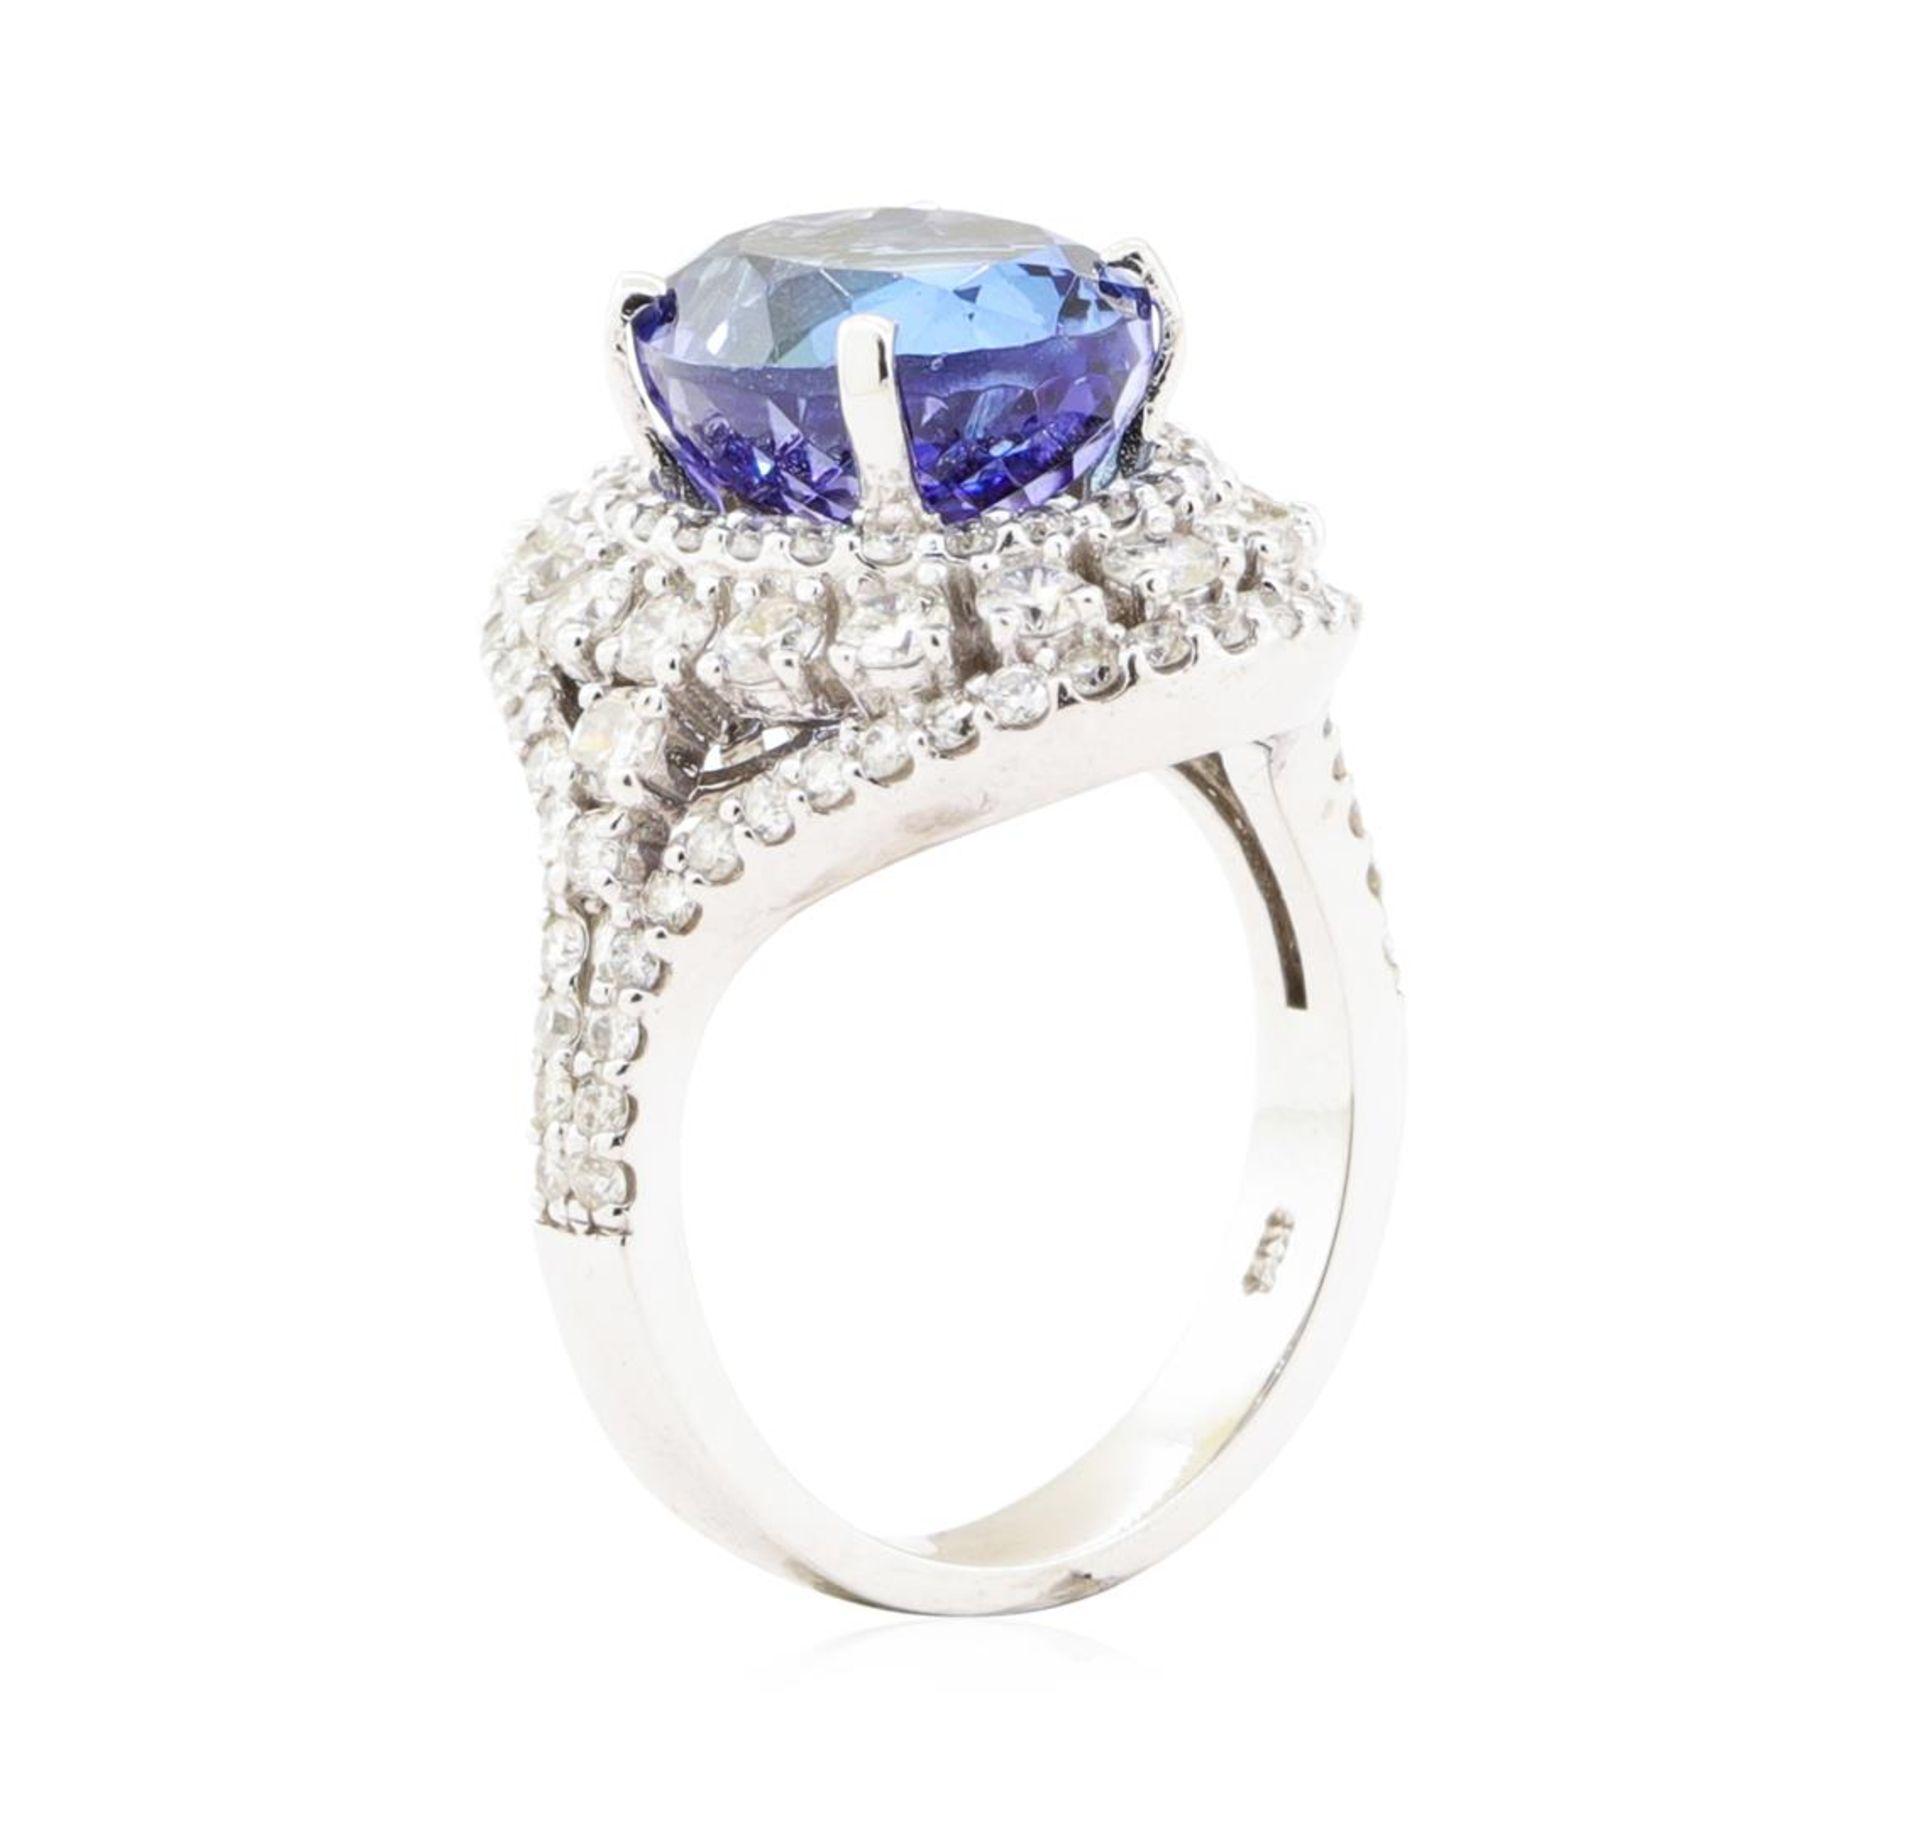 7.72 ctw Tanzanite And Diamond Ring - 14KT White Gold - Image 4 of 5